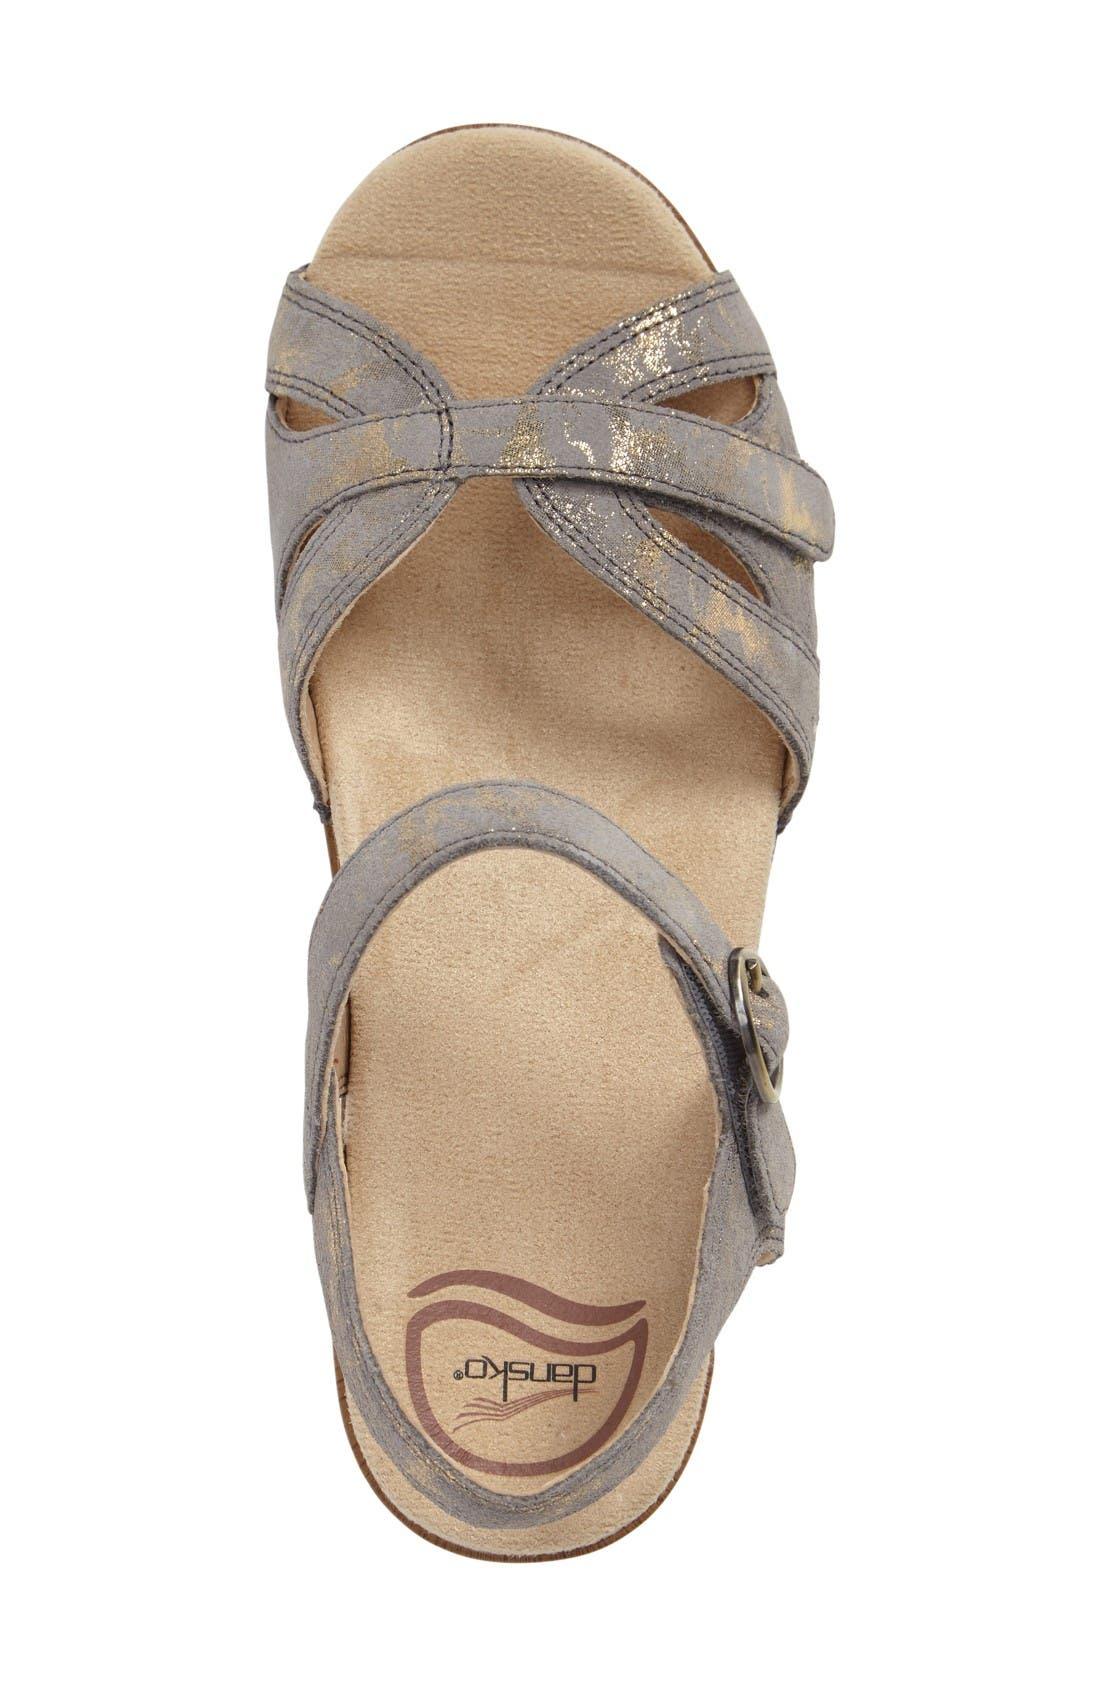 Season Sandal,                             Alternate thumbnail 3, color,                             Stone Leather